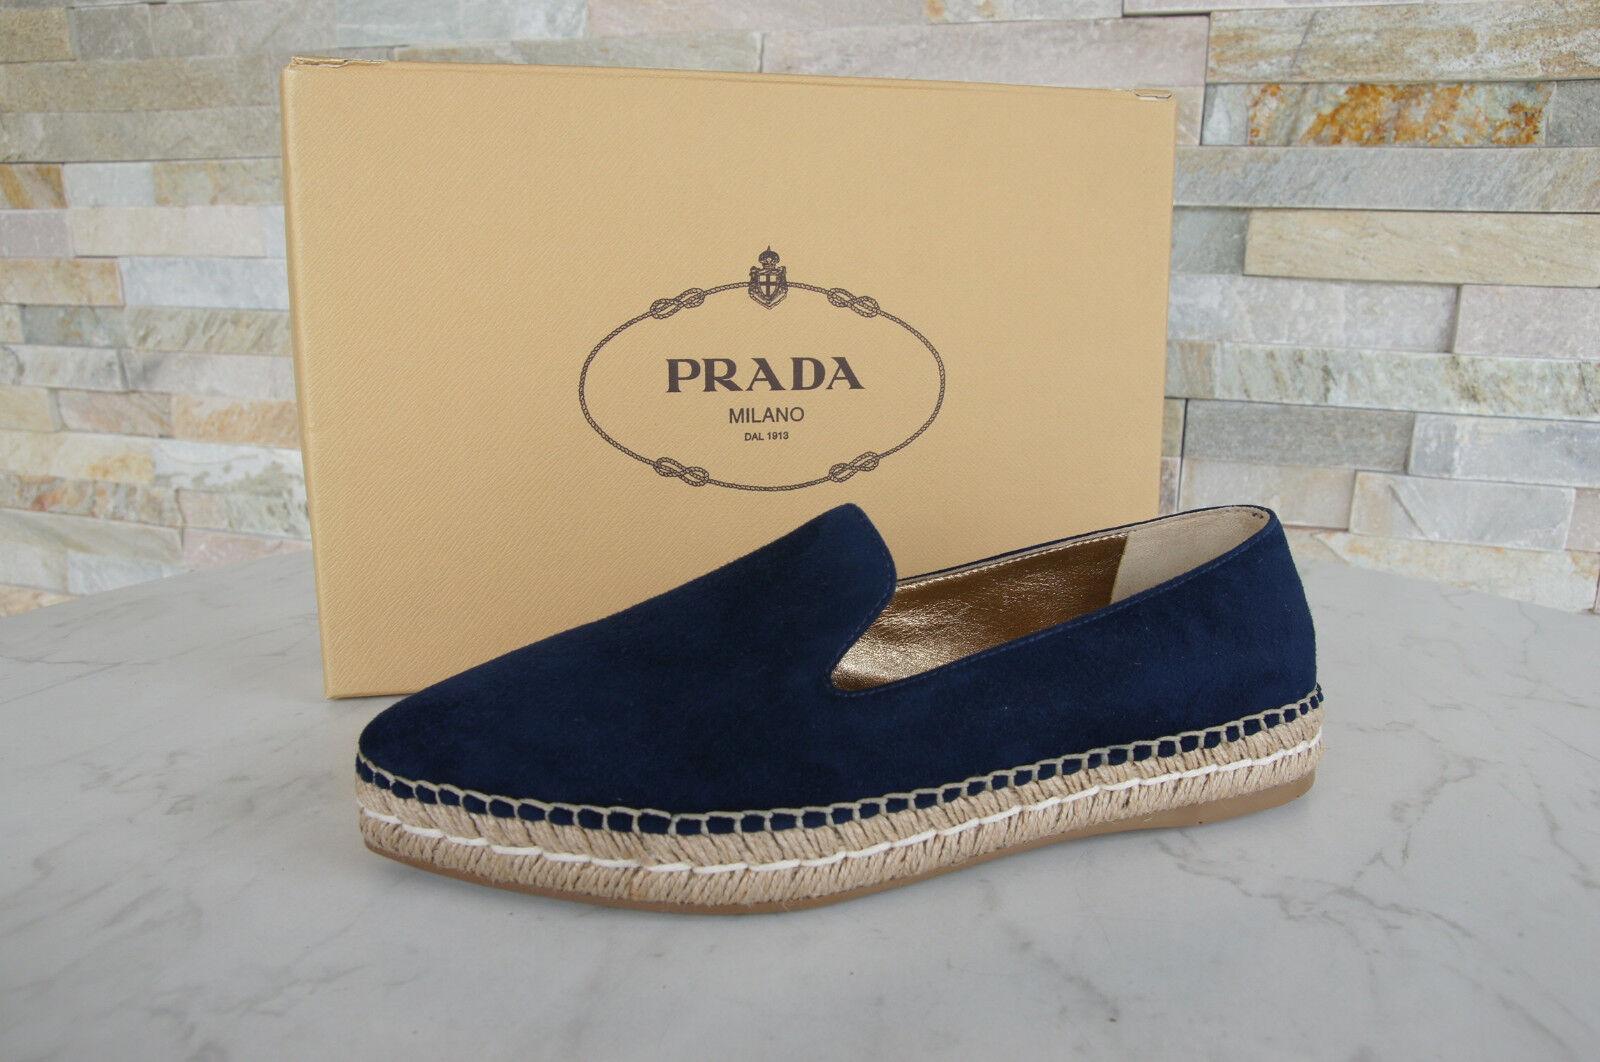 PRADA TAGLIA 40 nero Sandali Sandals 3x6143 Scarpe Velcro nero 40 NUOVO UVP a01c5c